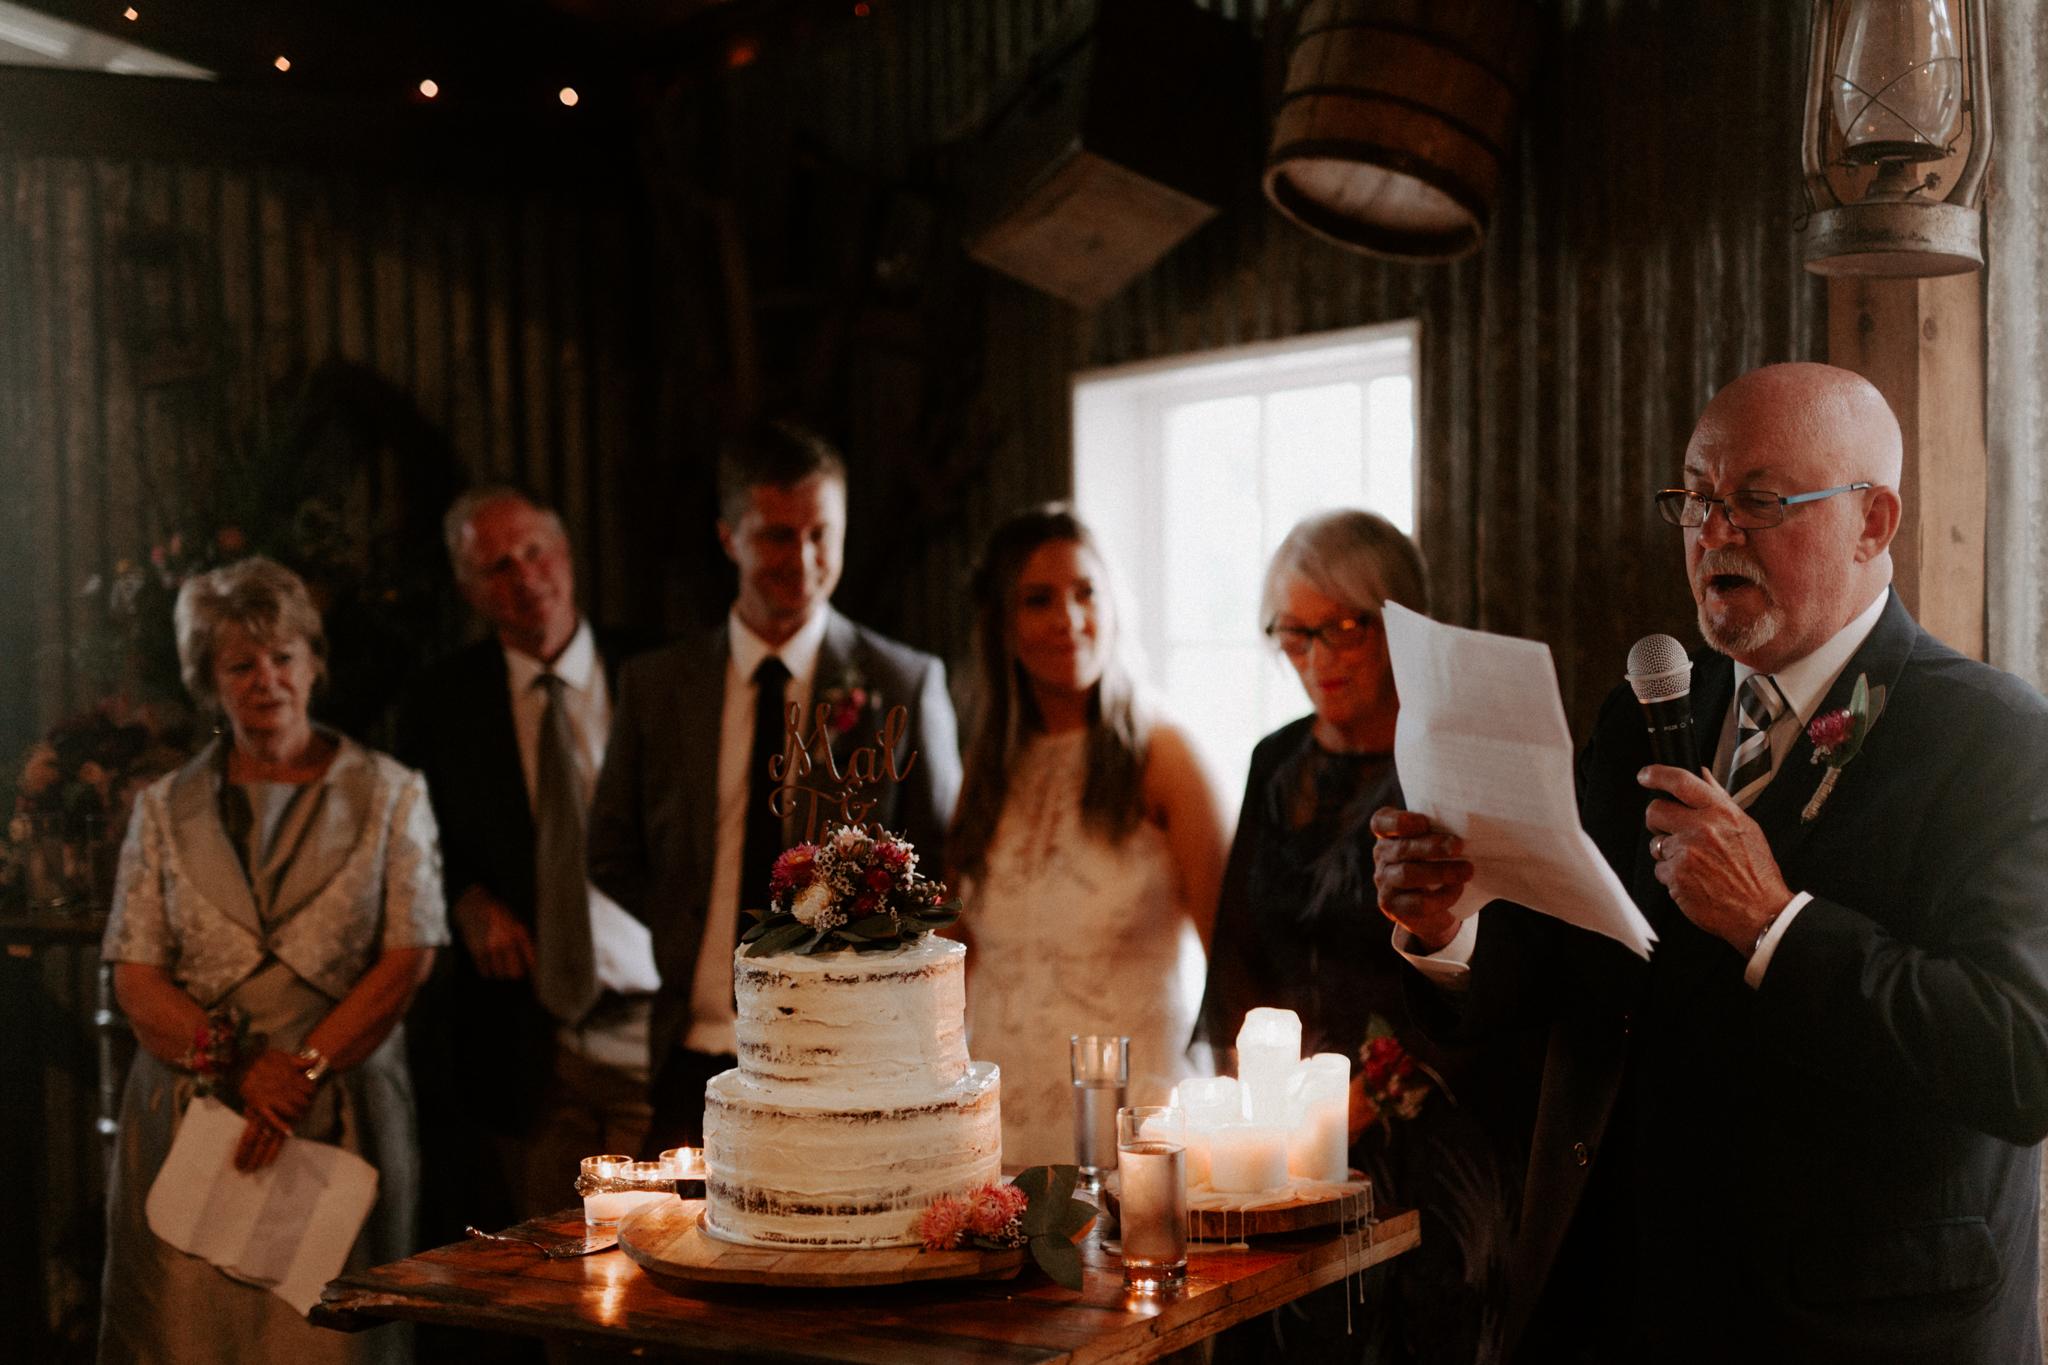 Wandin-Park-Estate-Wedding-Emotions-and-Math-Photography-179.jpg